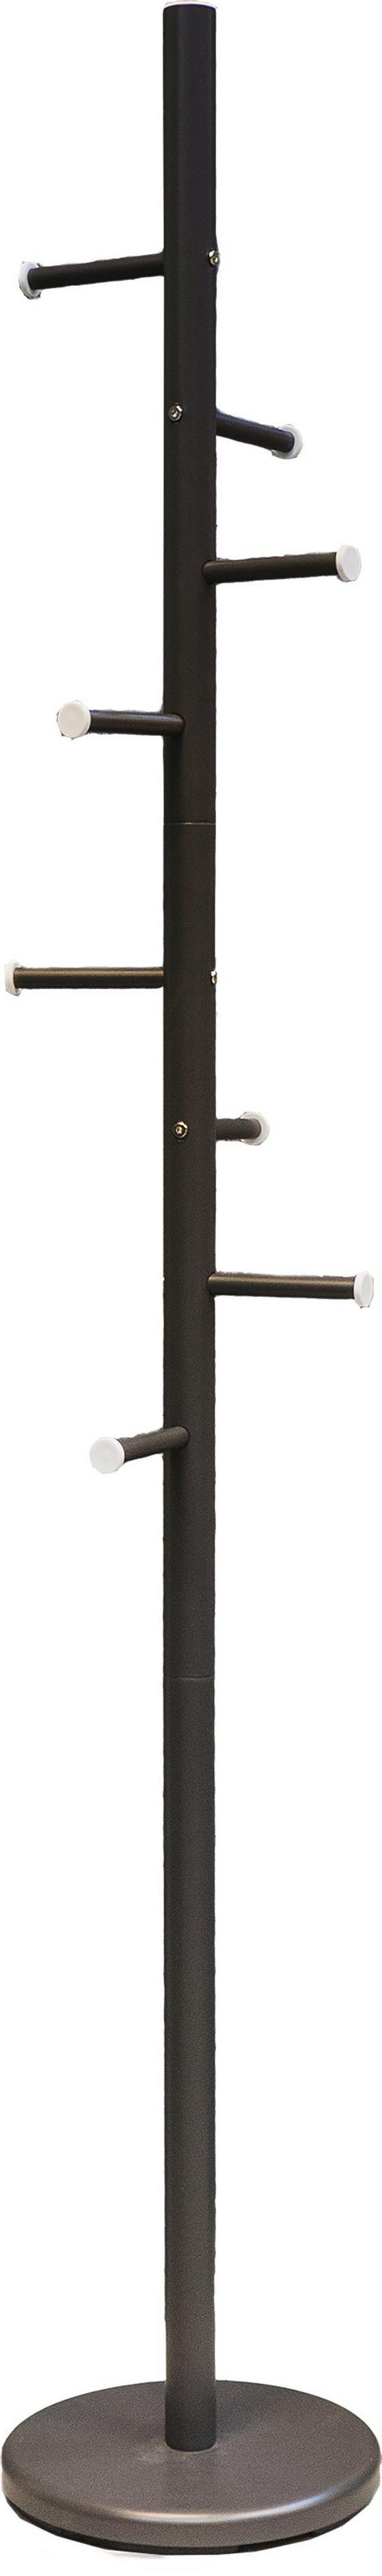 Samostoječ Obešalnik Aguero - antracit, kovina (28/180cm) - Mömax modern living